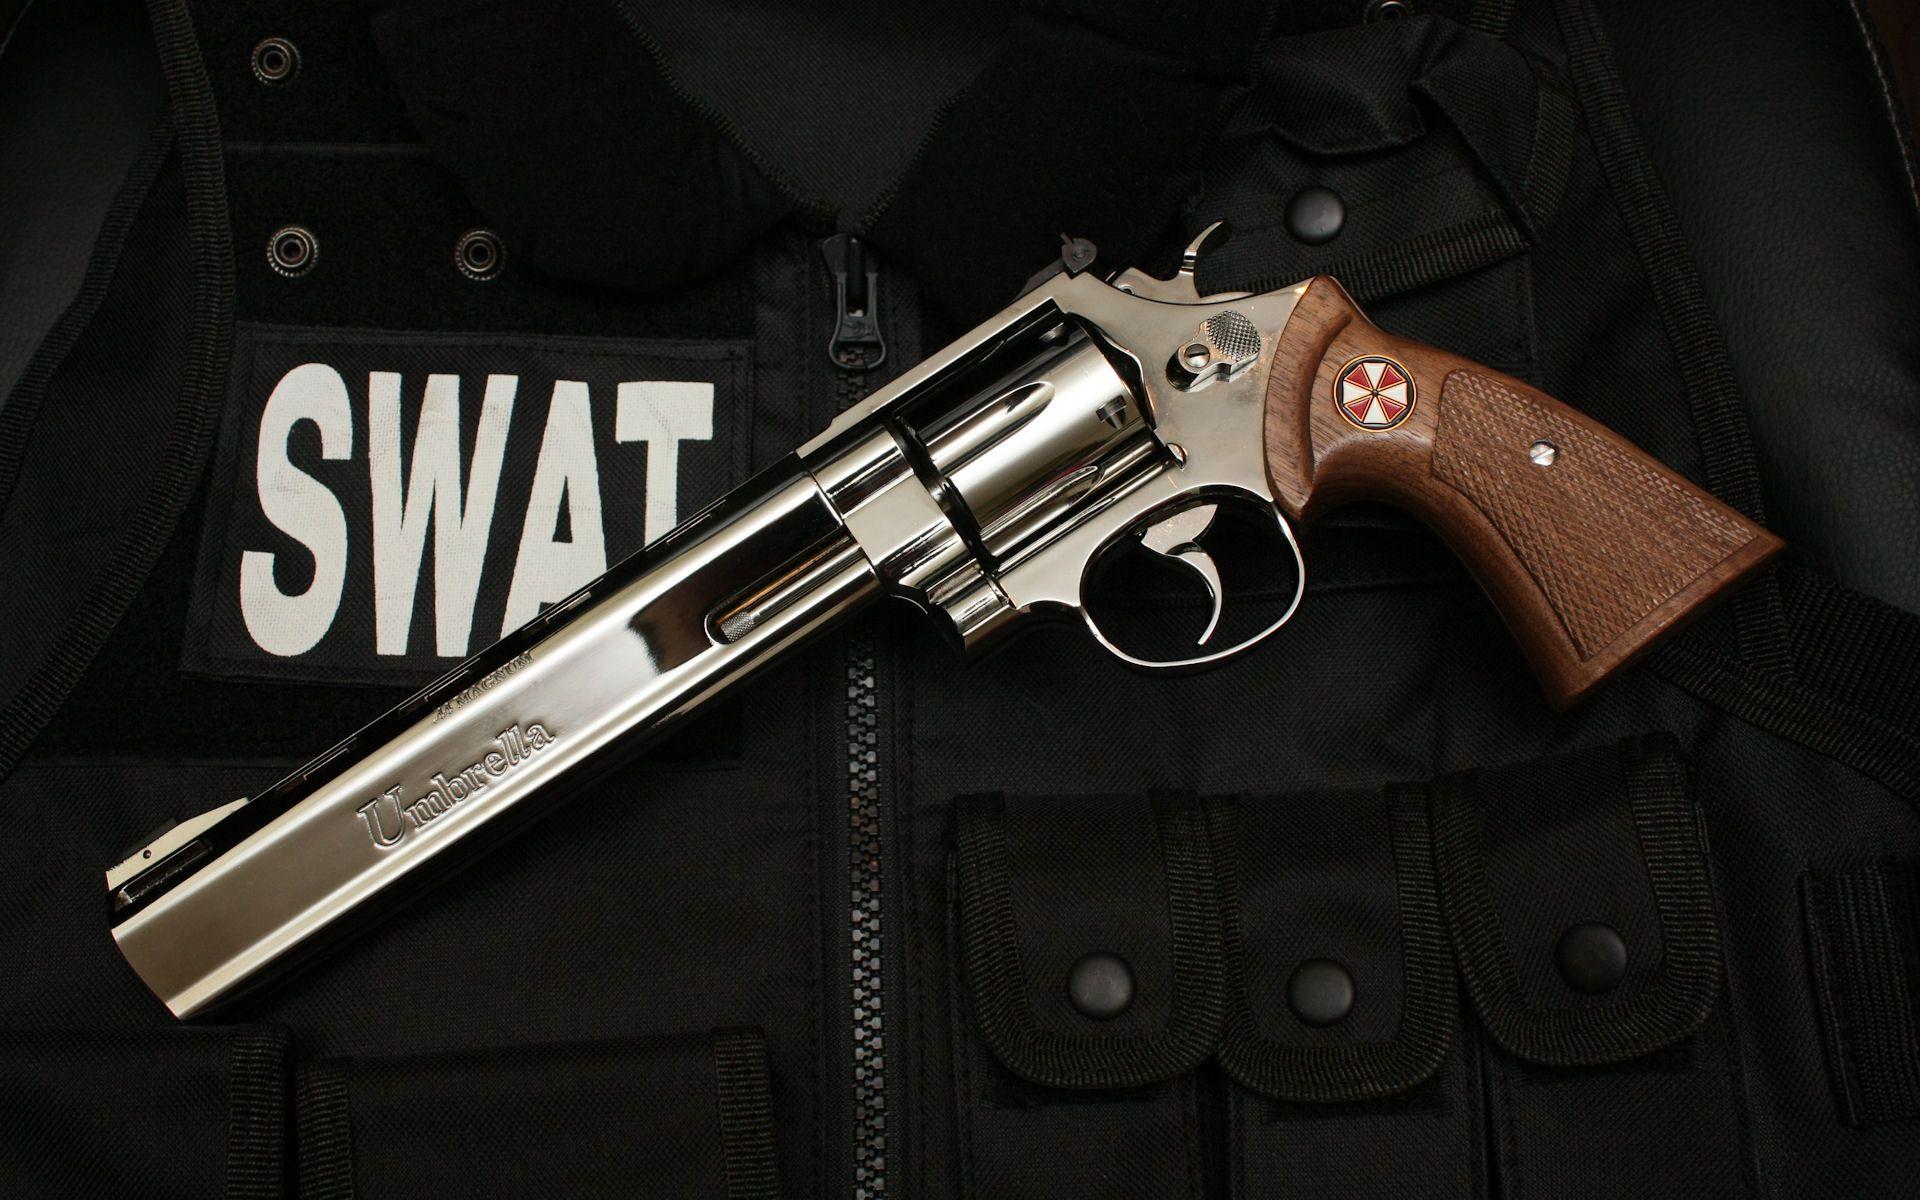 gun hd wallpapers revolver wallpapers hd pistol wallpaper free | hd